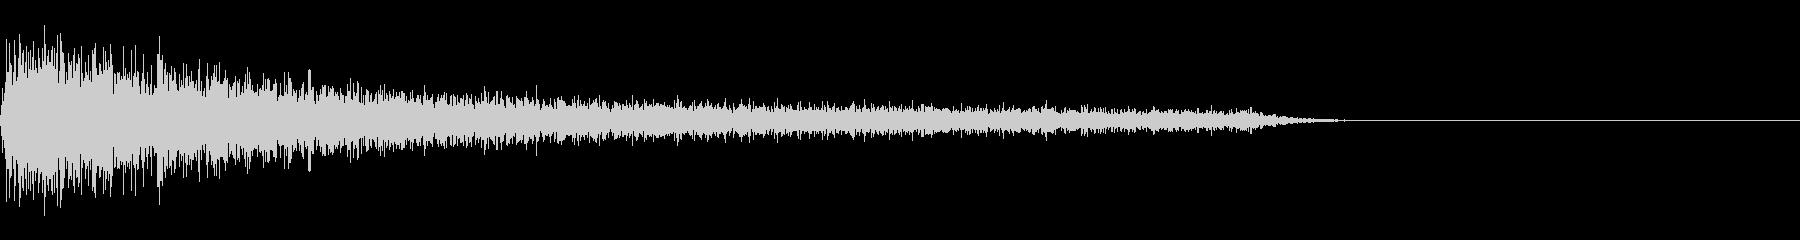 FX・SEピアノ/ショック/衝撃/1-Aの未再生の波形